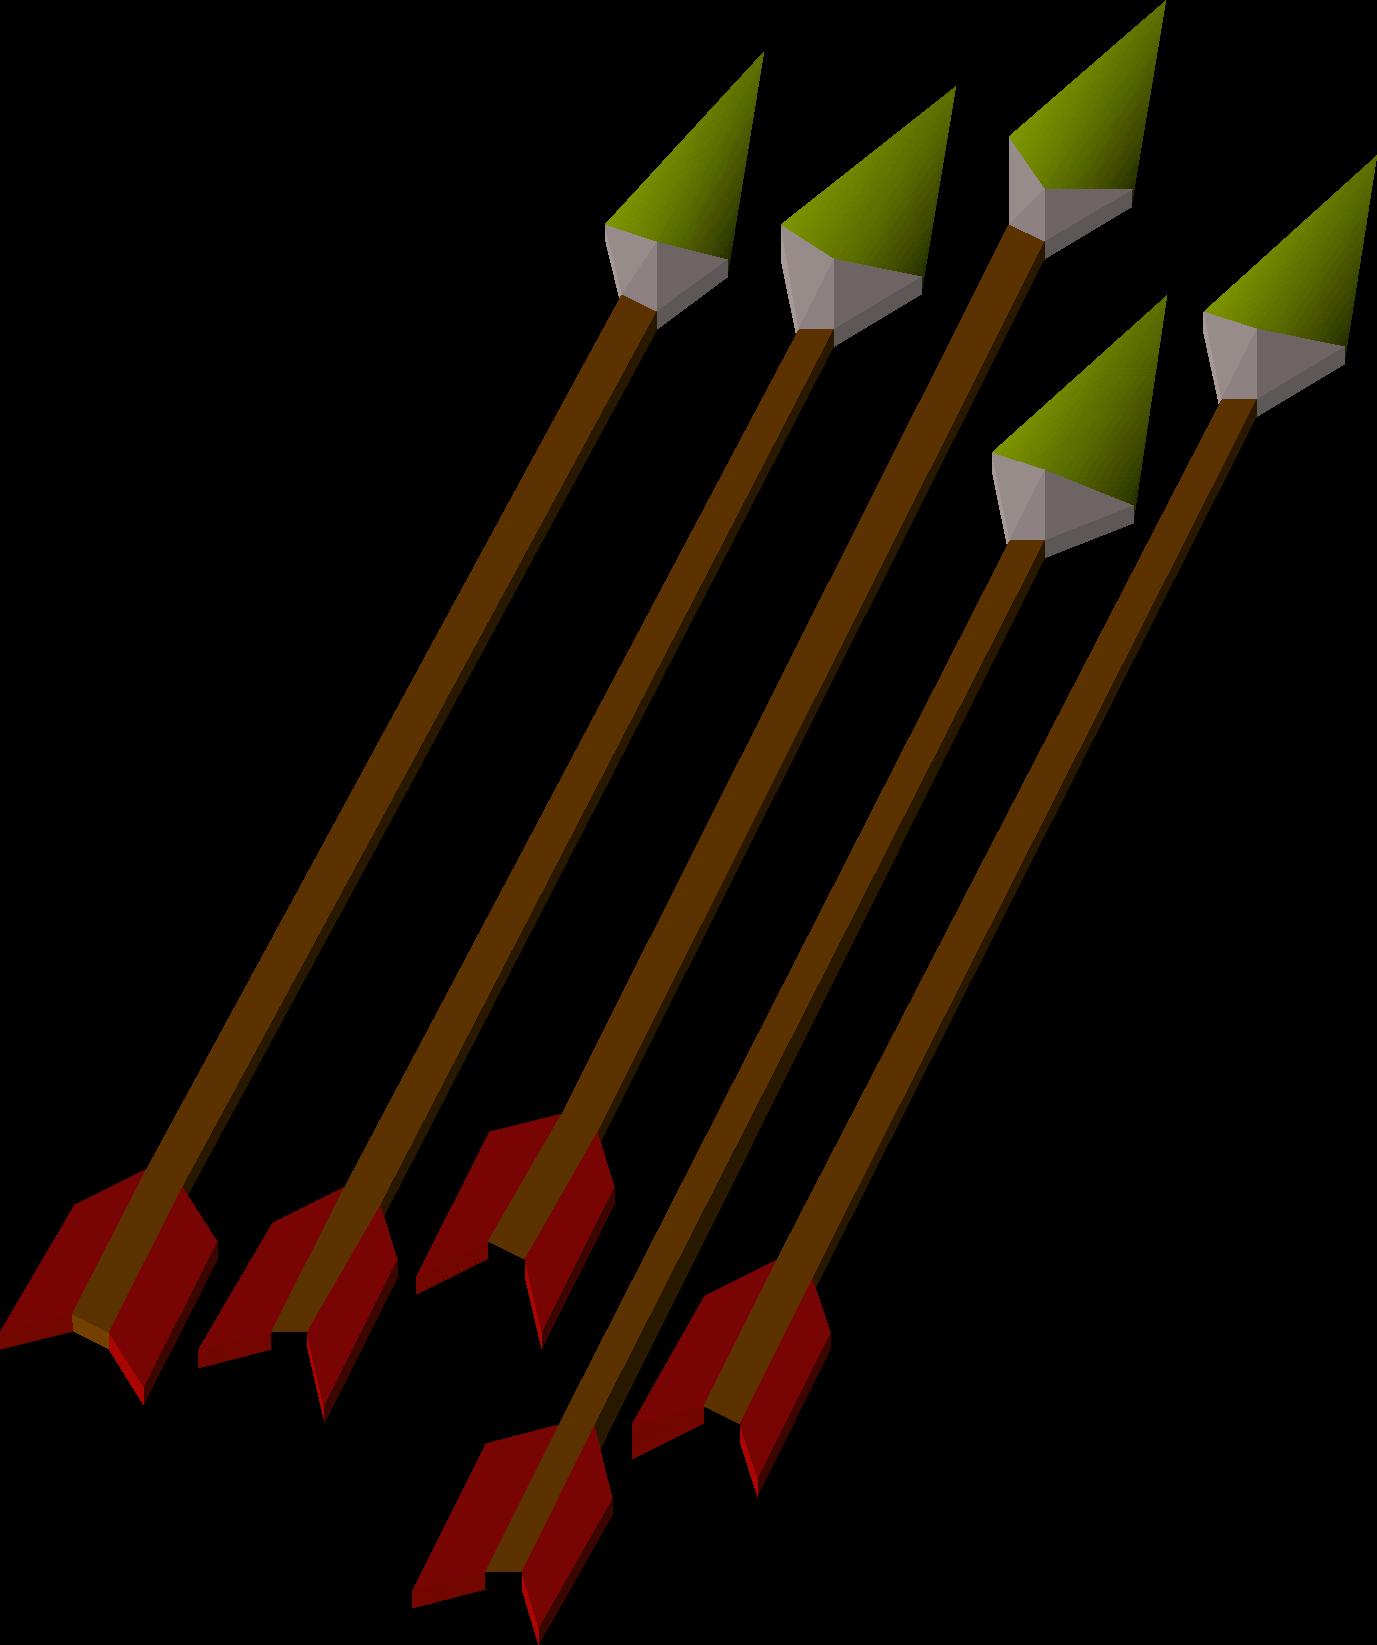 Picture of a arrow graphic royalty free Steel arrow | Old School RuneScape Wiki | FANDOM powered by Wikia graphic royalty free